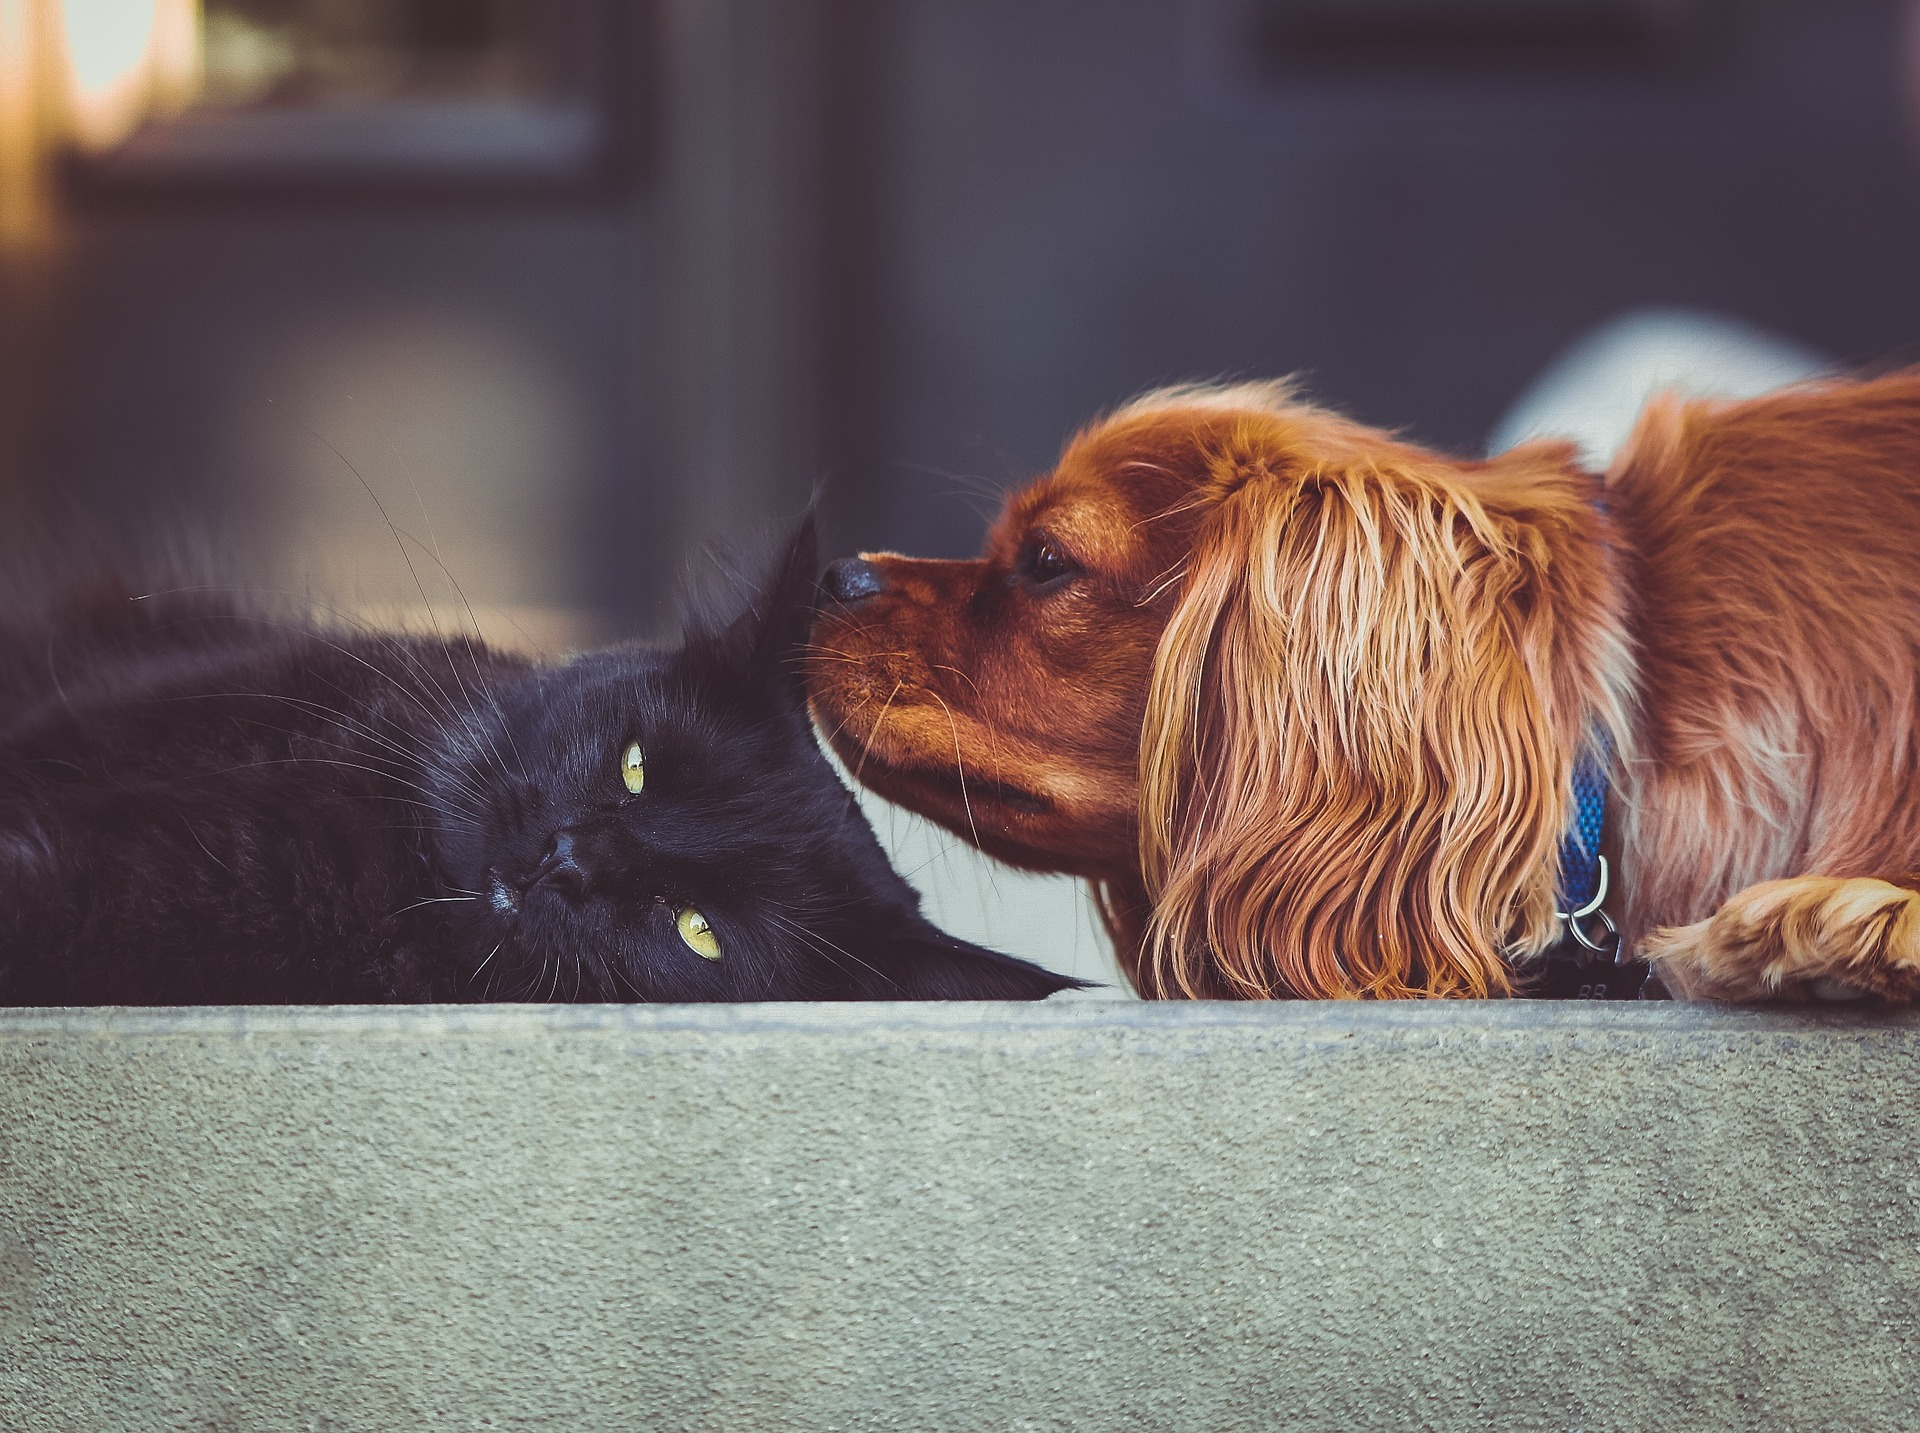 download Wallpaper: kat en hond wallpaper